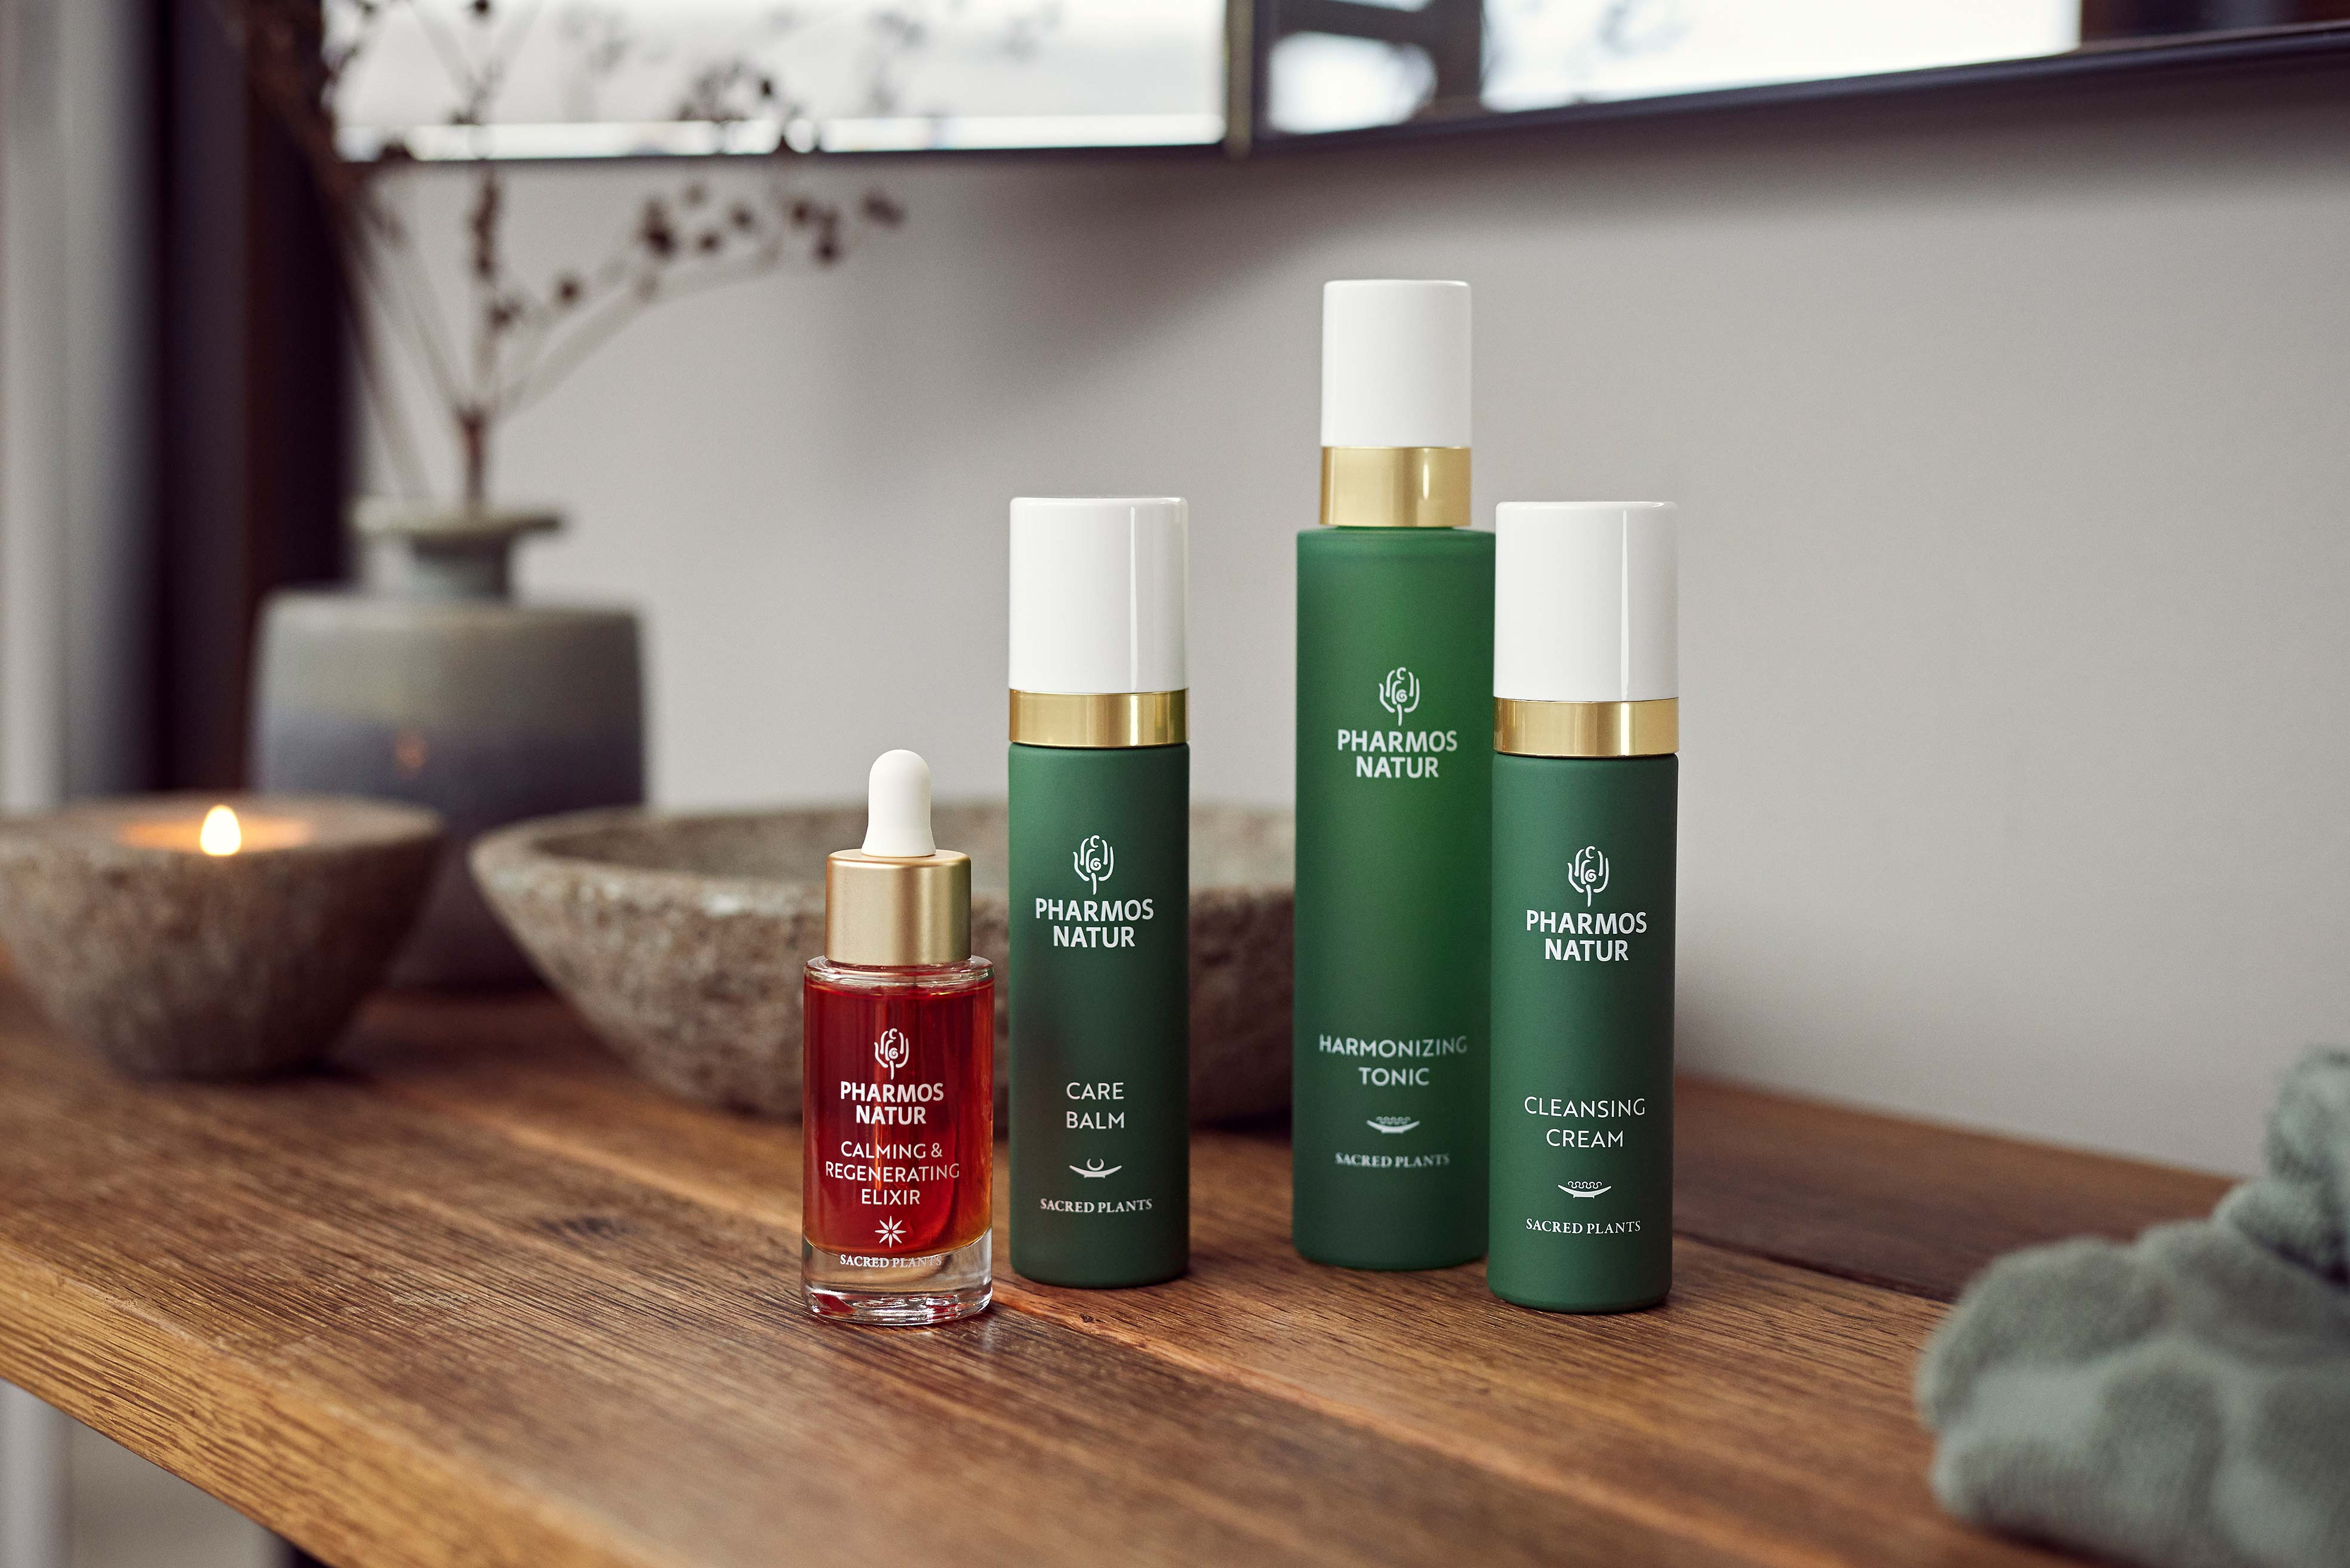 3 grüne Flaschen Care Balm, Harmonizing Tonic und Cleansing Cream mit rotem Öl Serum Calming & Regenerating Elixir